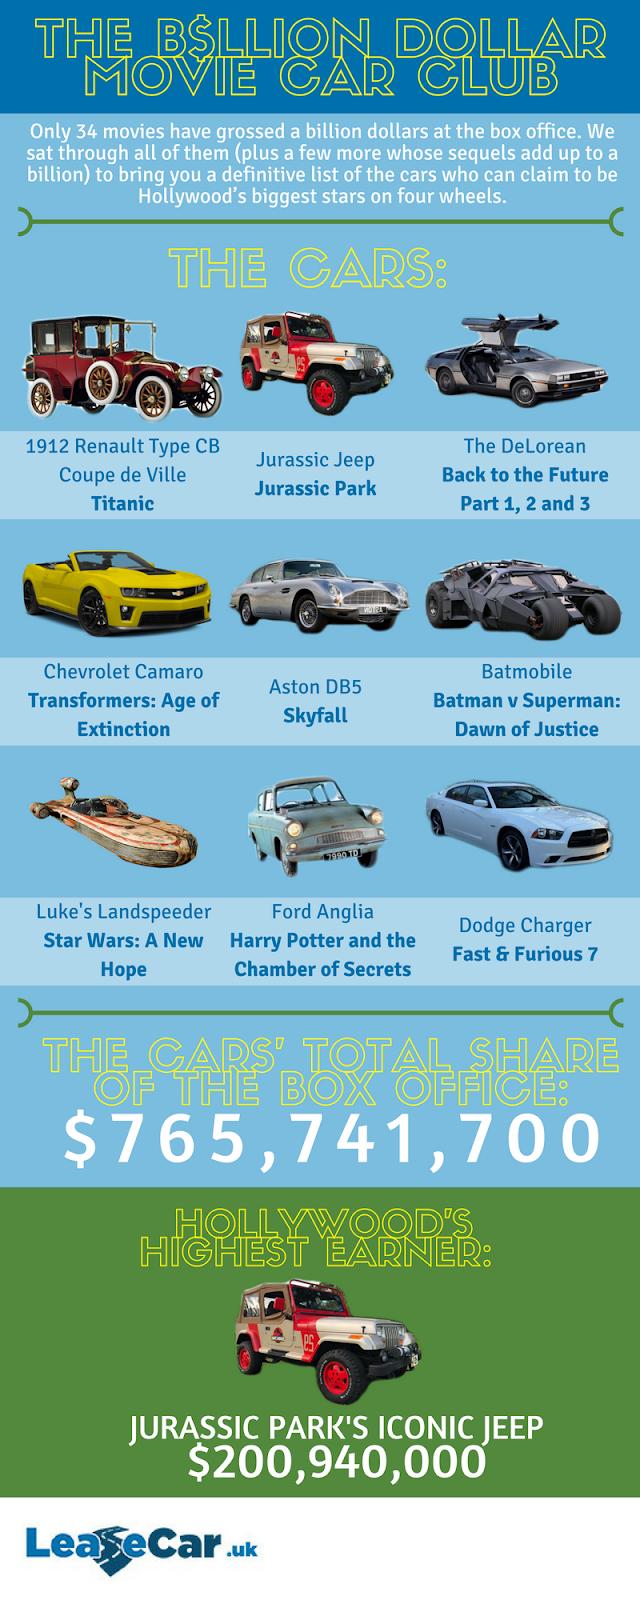 Ncis Team Dodge Charger Roblox The Billion Dollar Movie Car Club The World S Biggest Stars On Four Wheels